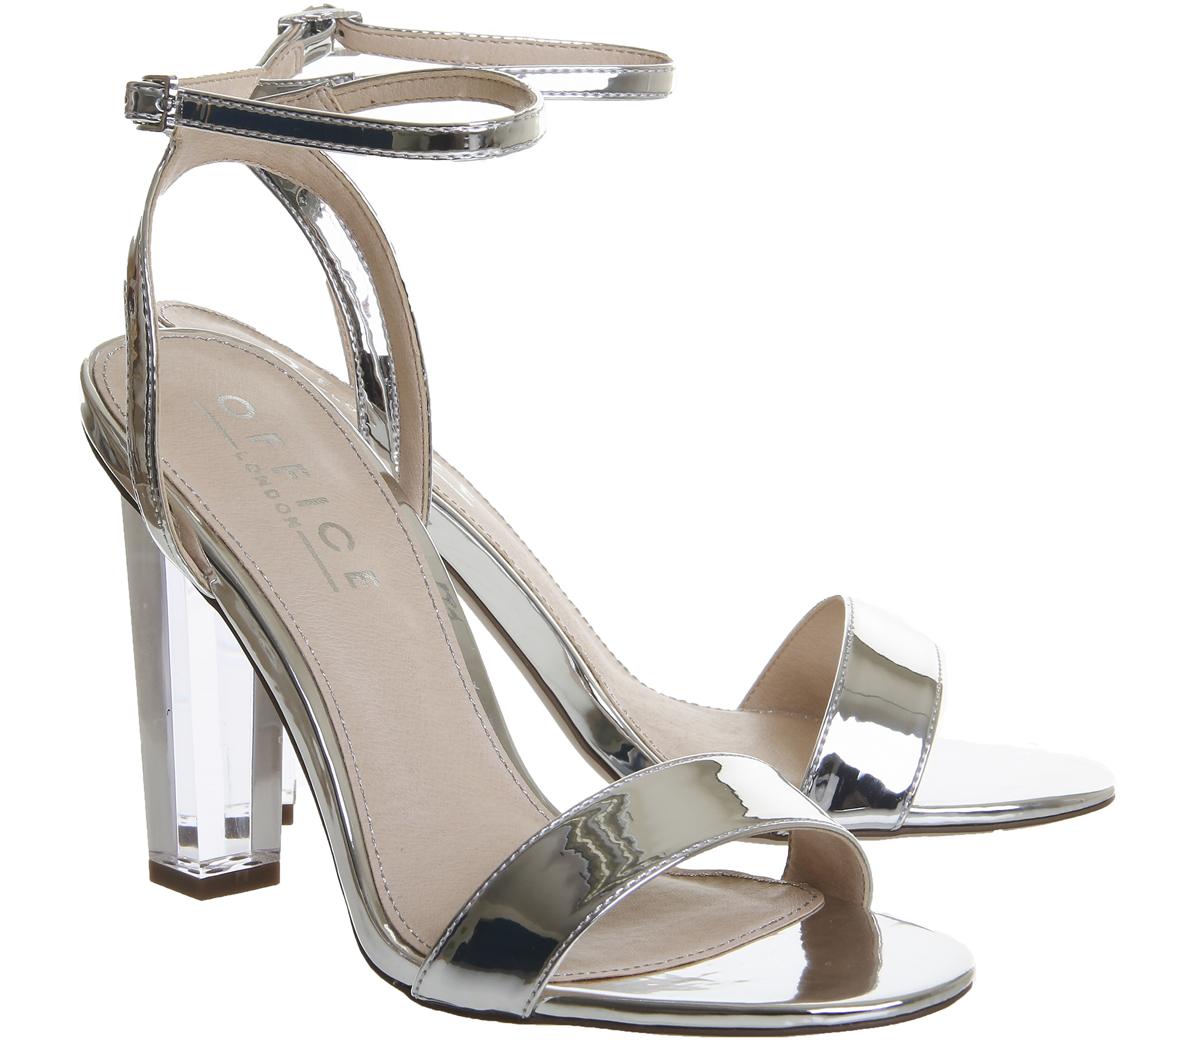 b8e2215f143 Sentinel Womens Office Hover Transparent Heel Sandals Silver Mirror Heels